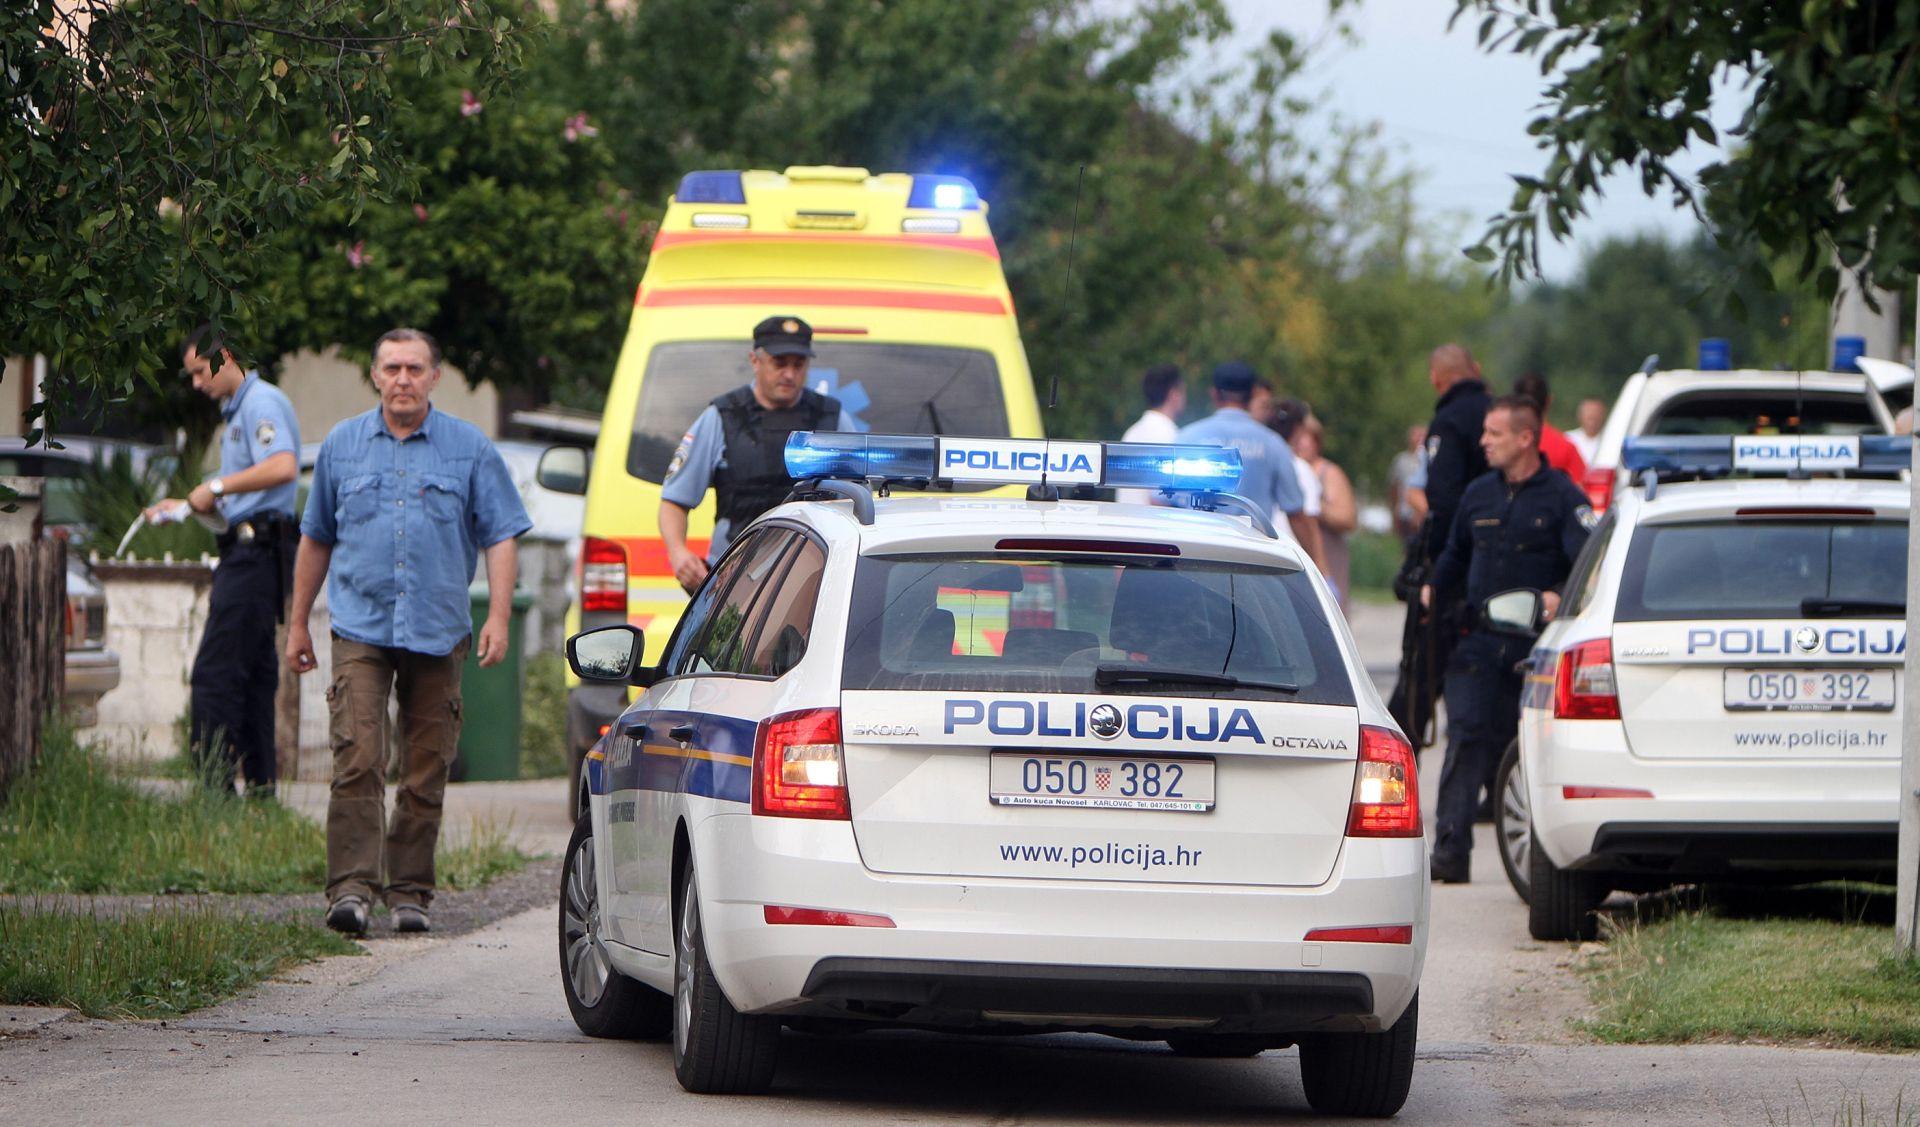 NESREĆA U ZAGREBU: Poginuo vozač mopeda